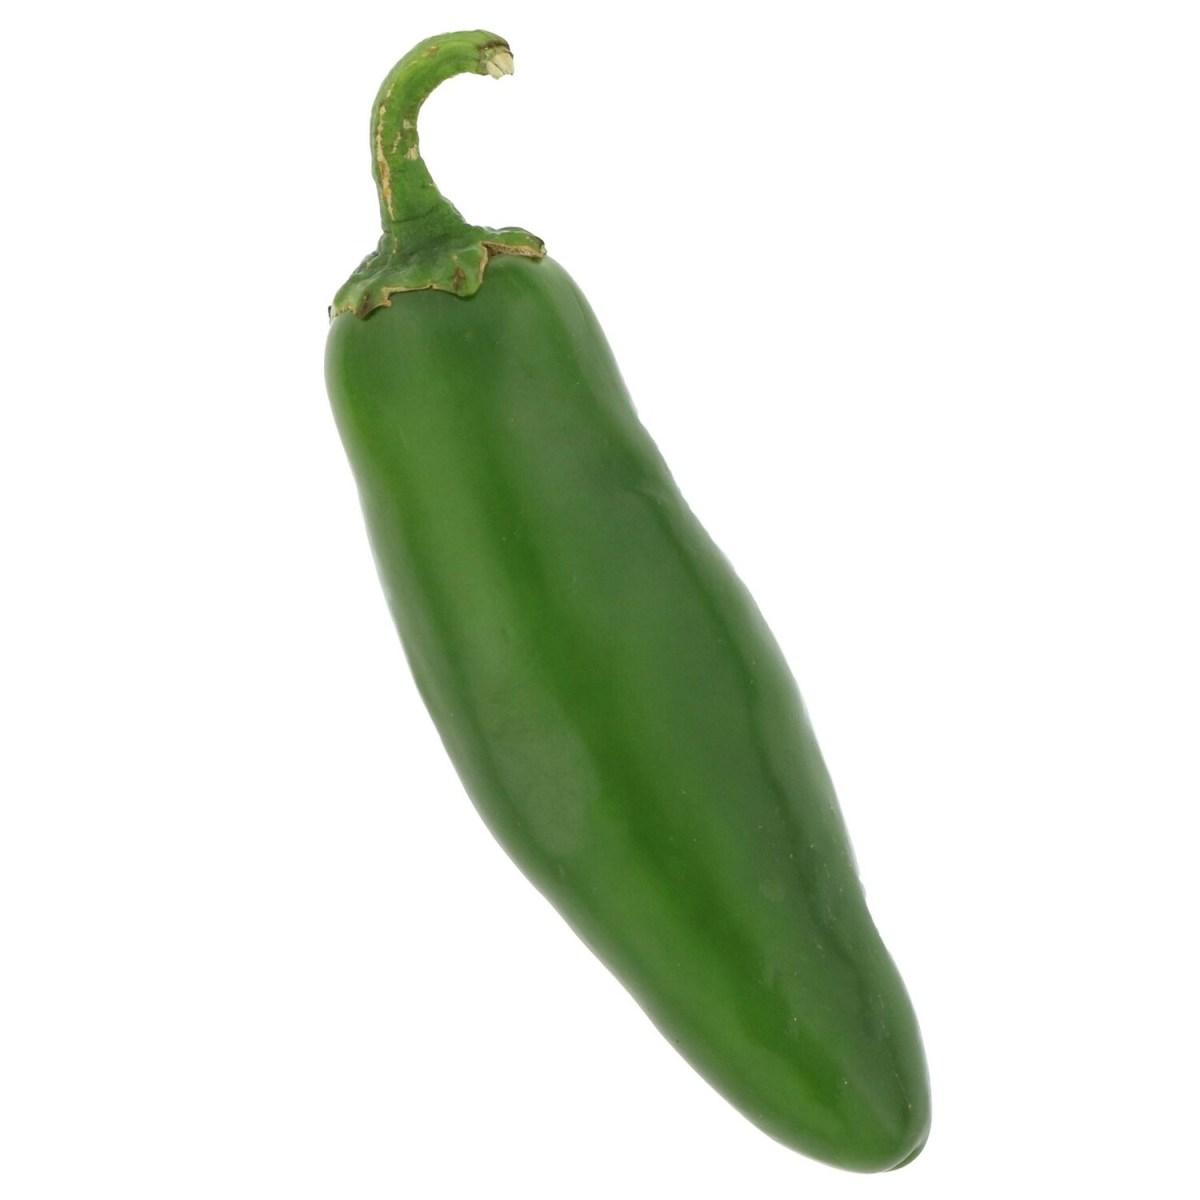 Jalapeno Pepper - each